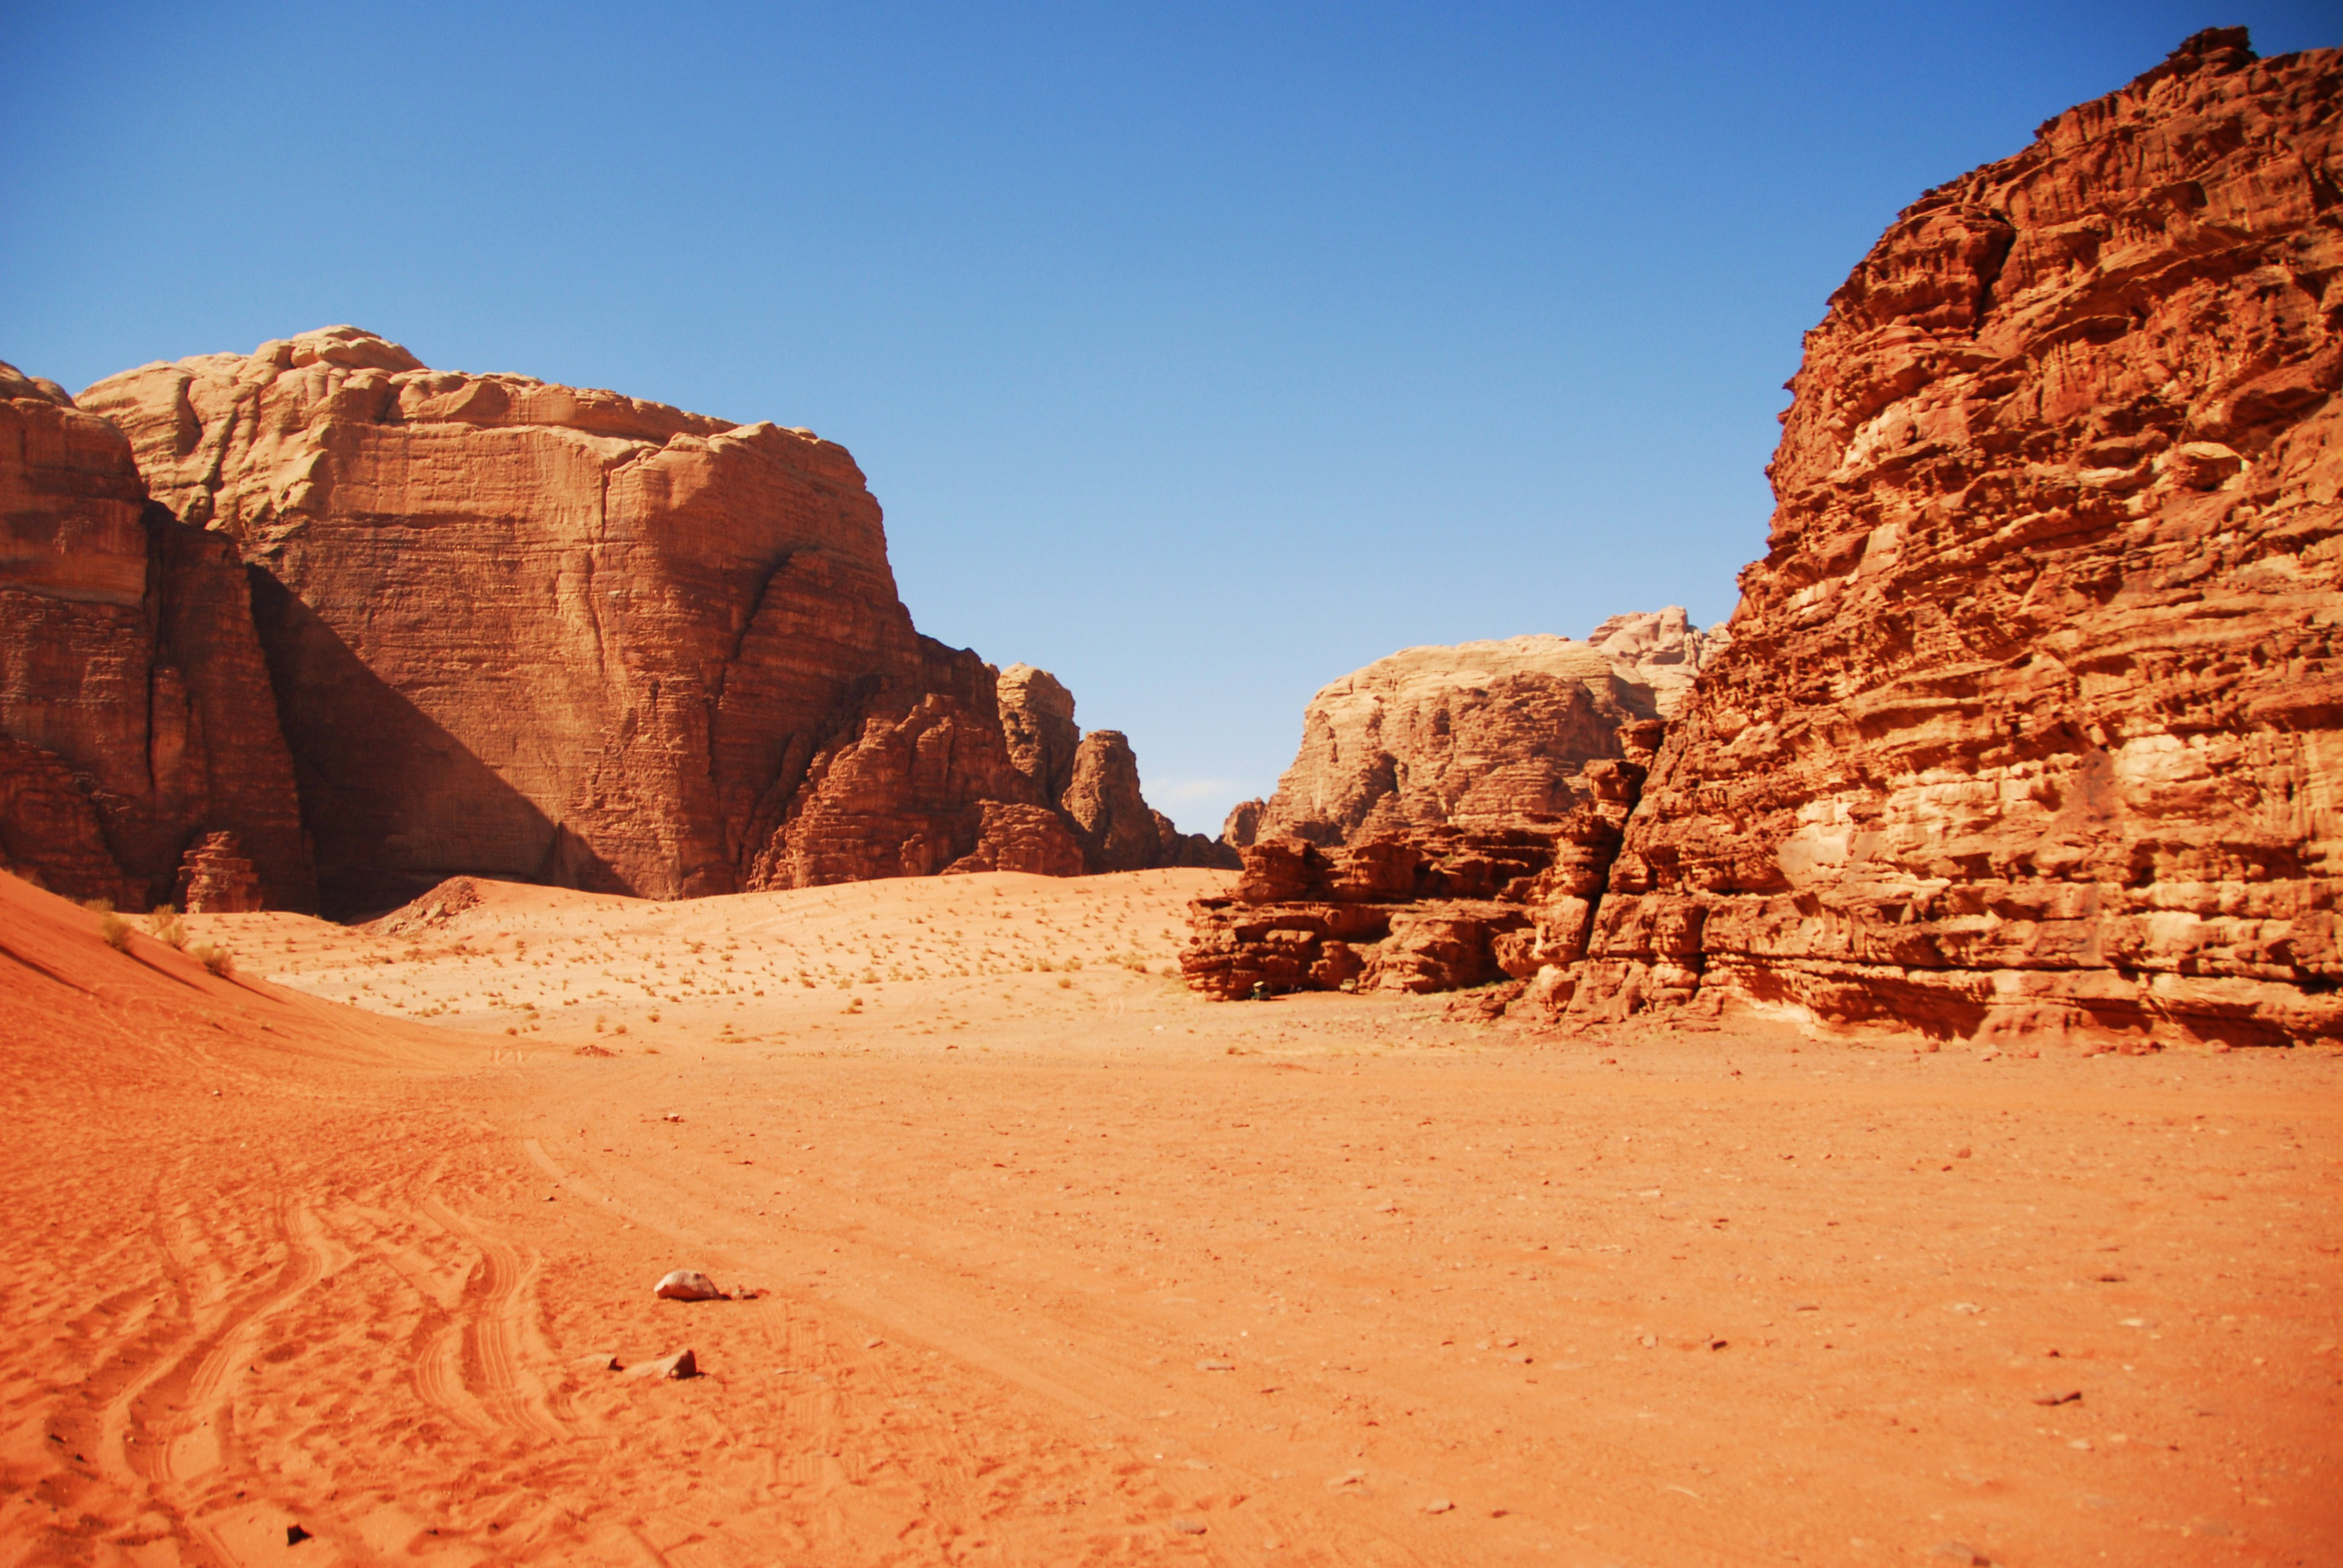 Petra Jordan Hd Wallpaper Waddling Through Wadi Rum Desert Gypsy Momma